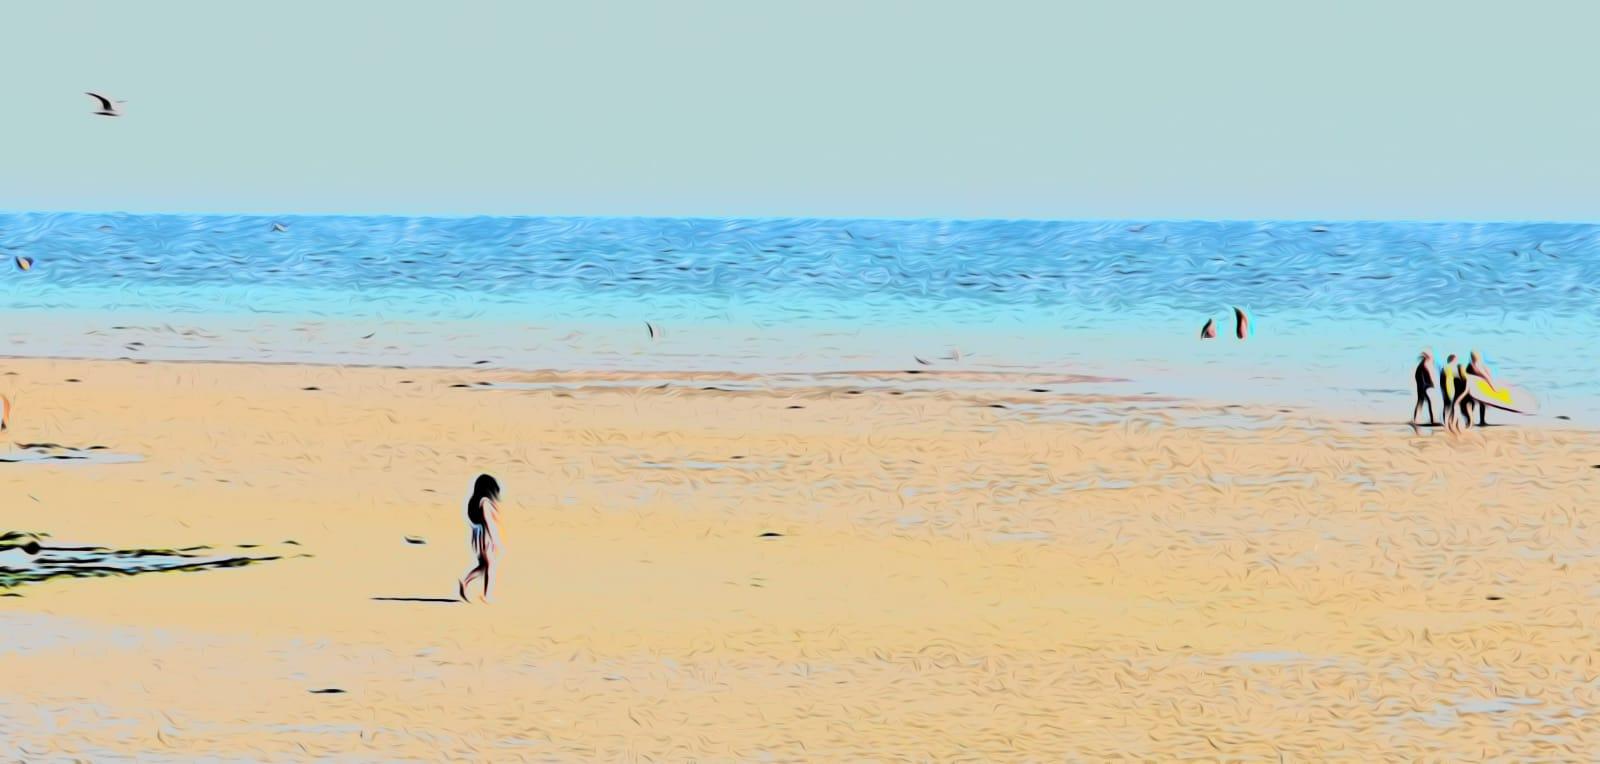 Rez_worthing beach_colour